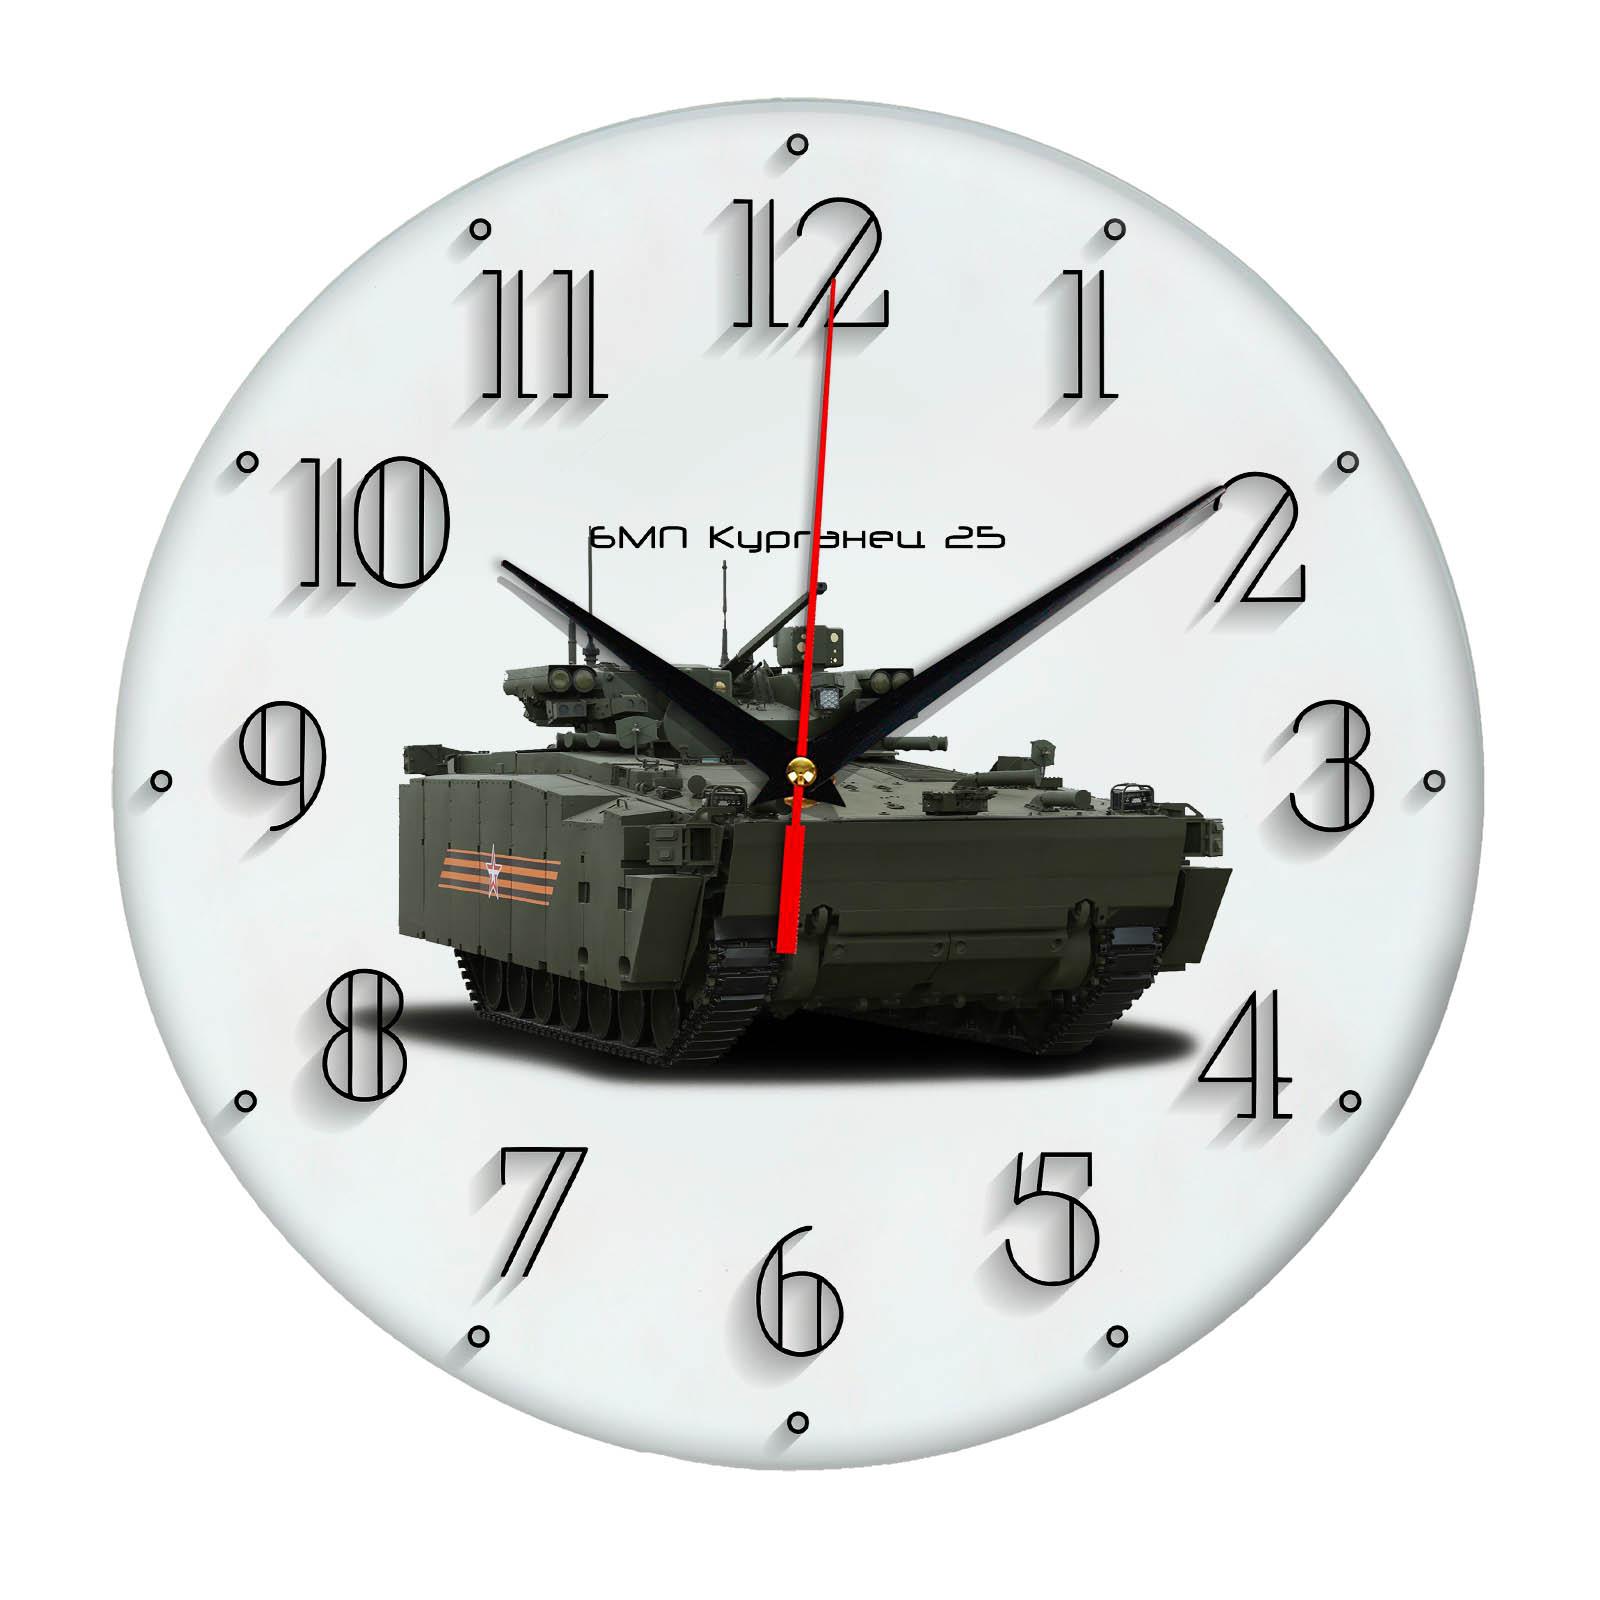 часы-сувенир «БМП Курганец 25» Армия России 15